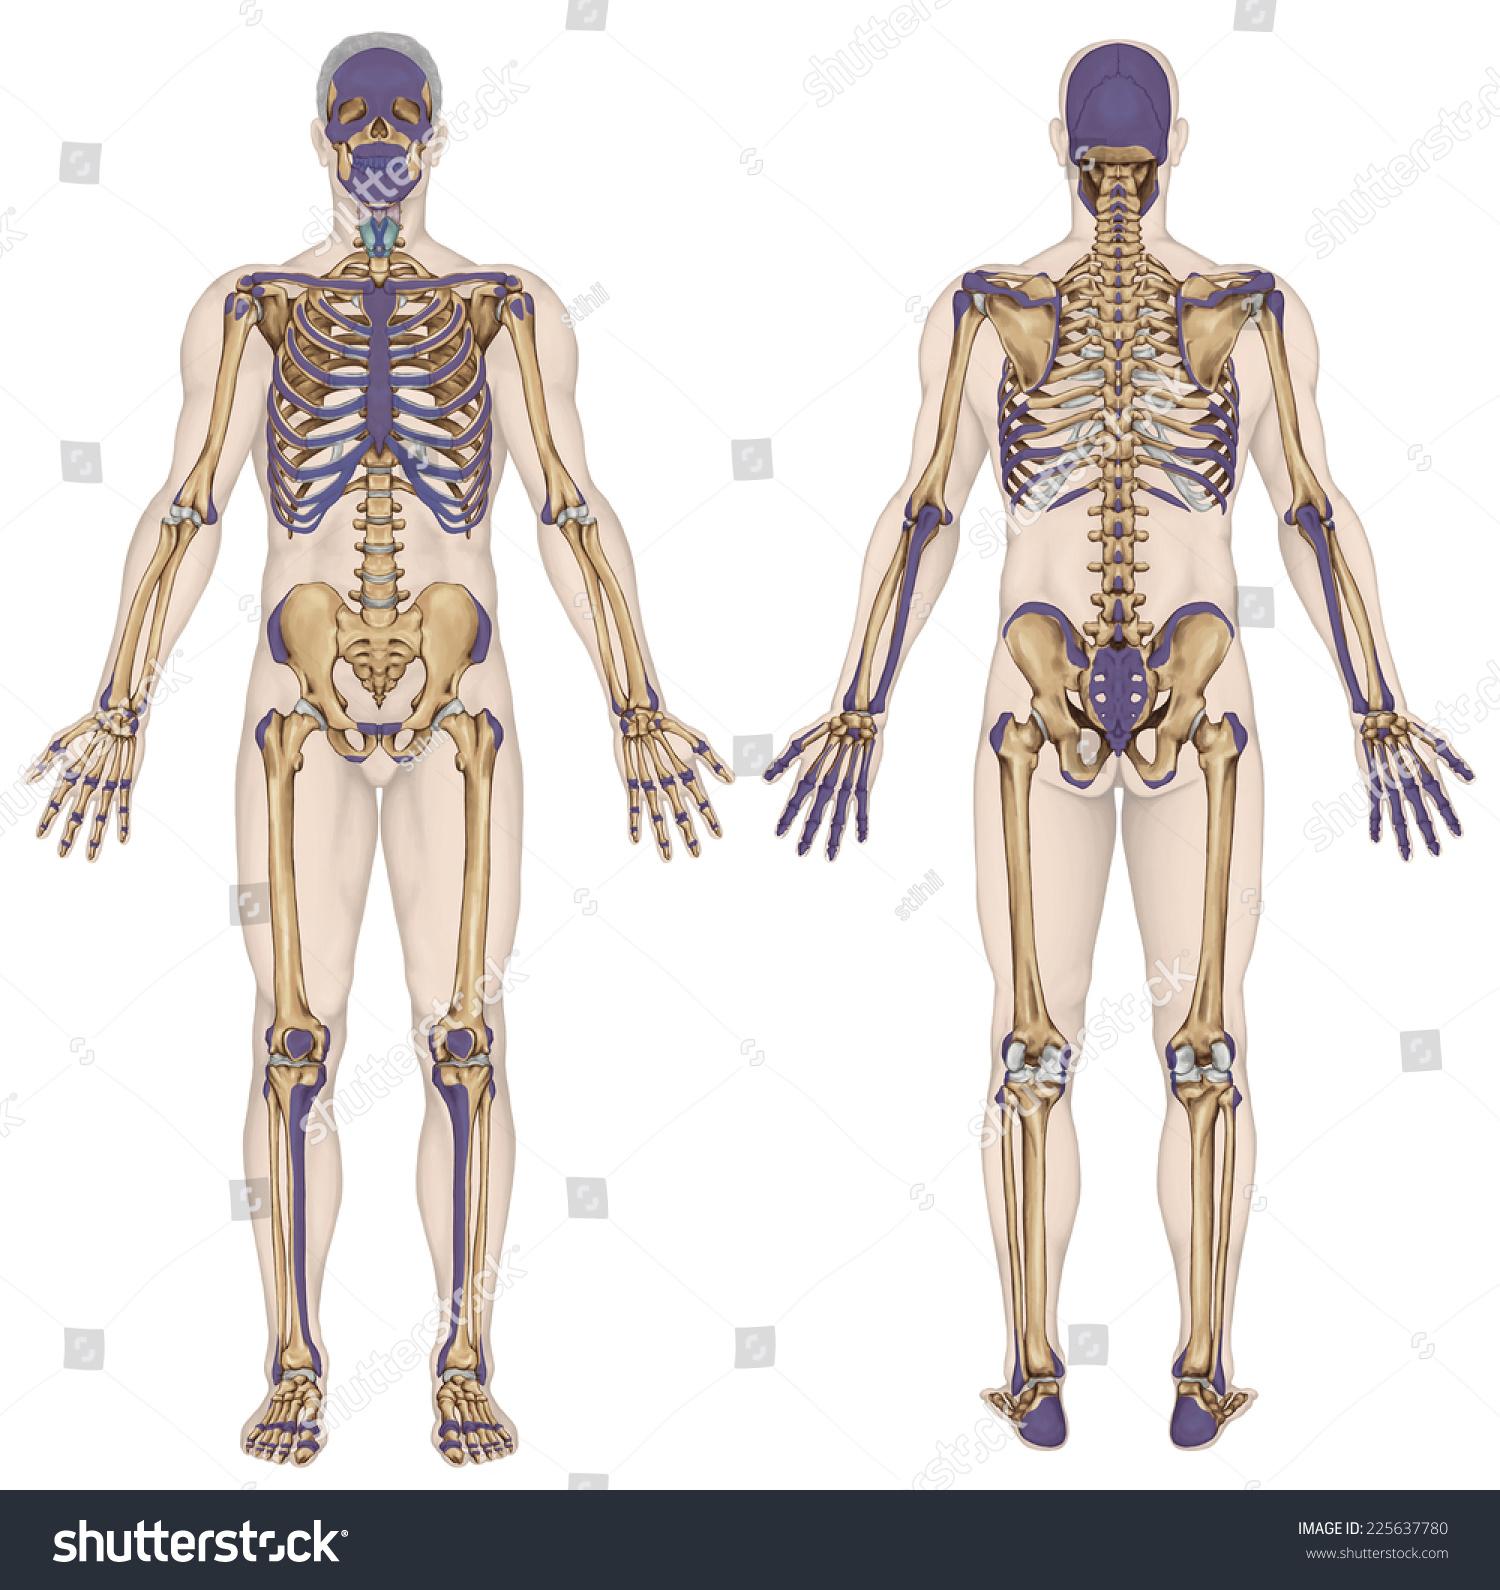 Anatomical Body Human Skeleton Anatomy Human Stock